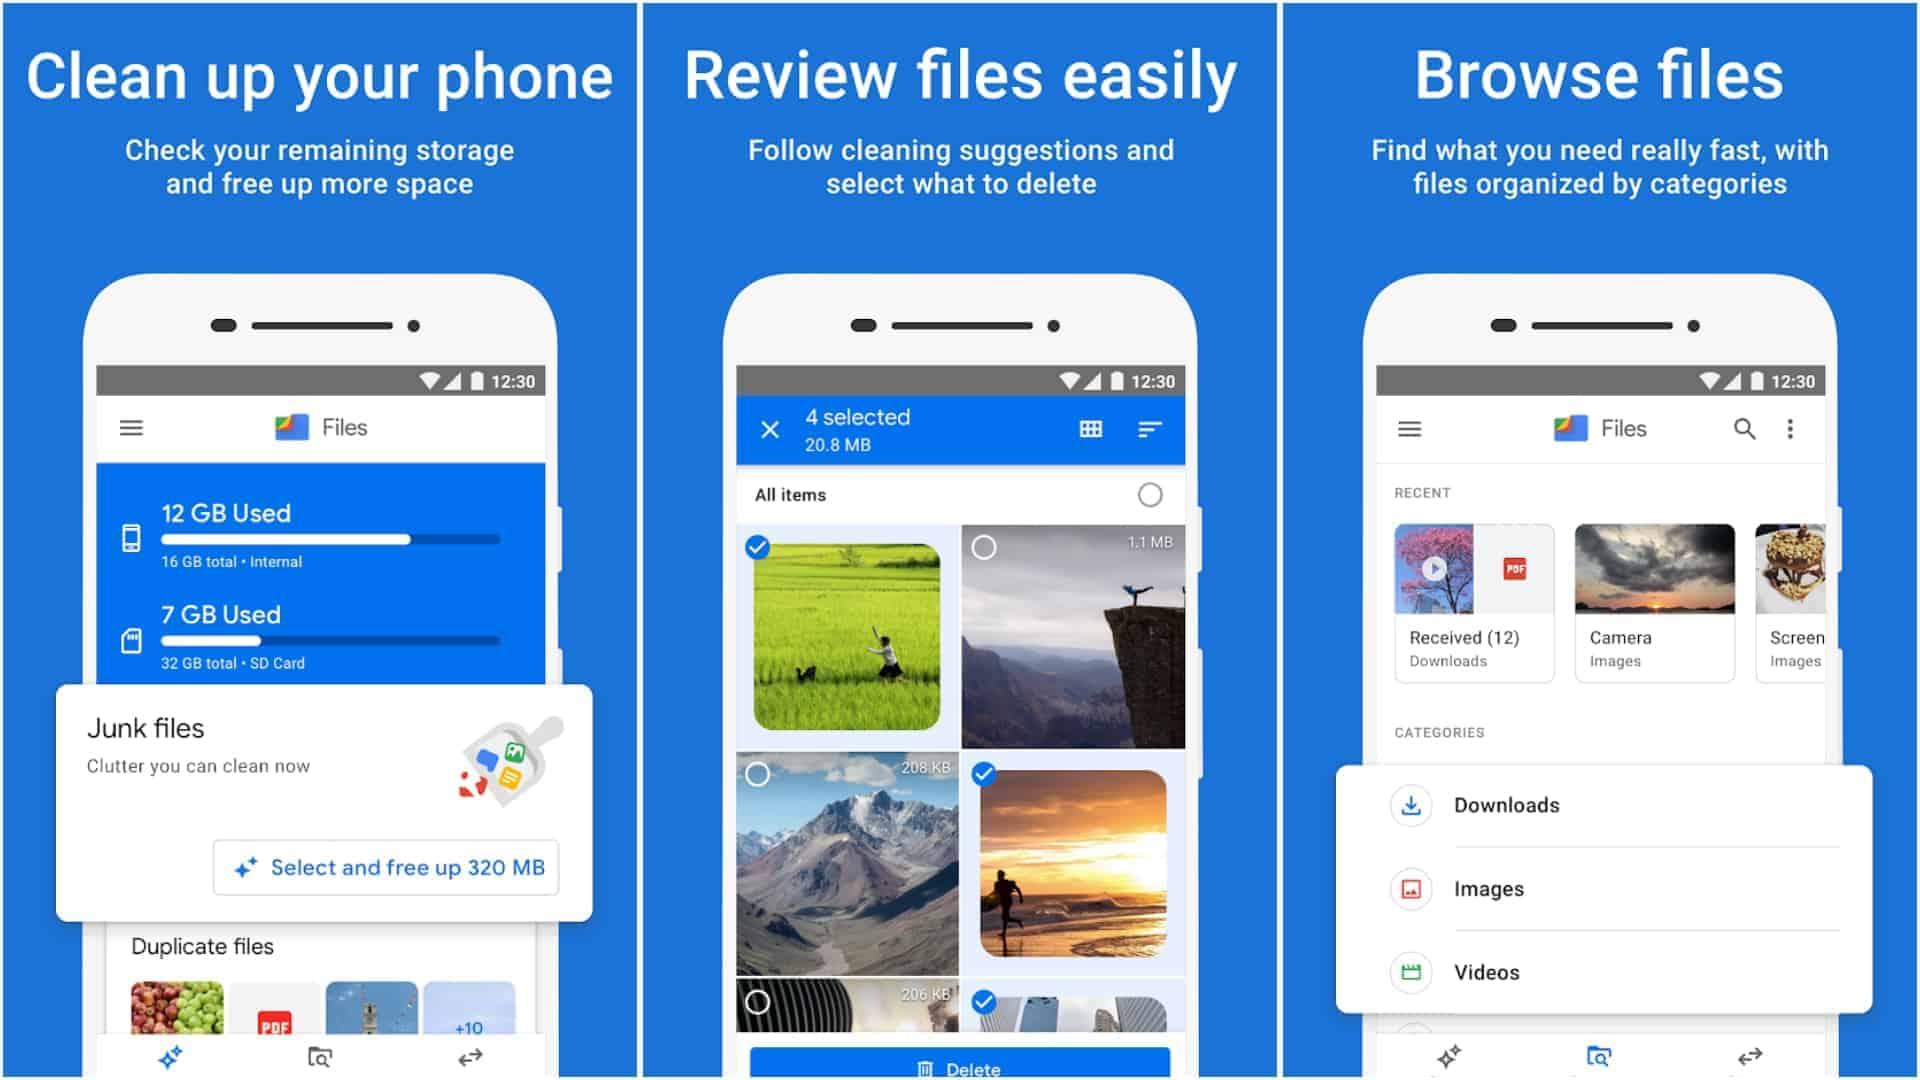 Files by Google app image May 2020